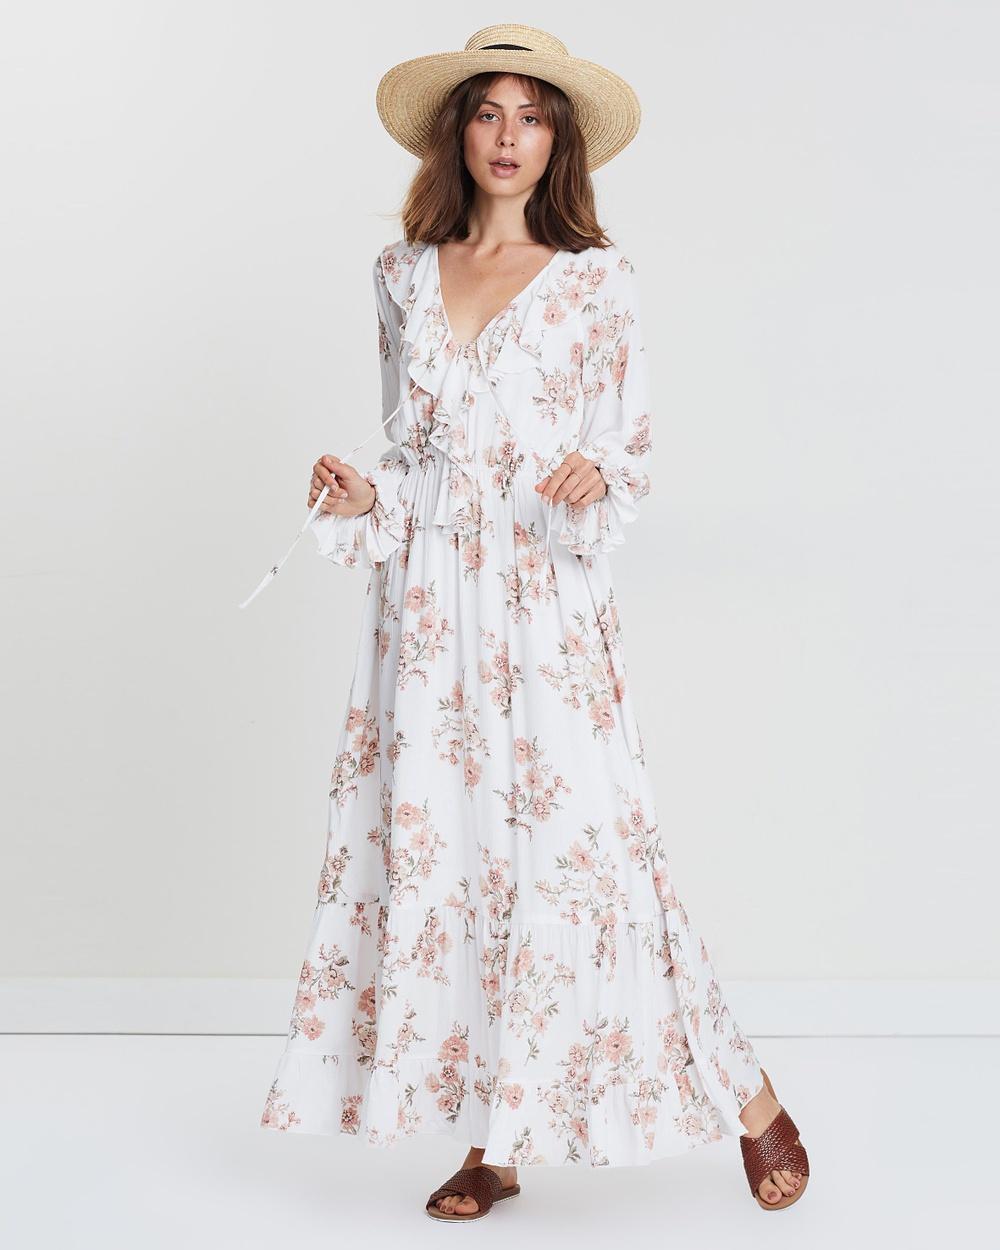 Wilde Willow White & Floral Enlighten Floral Maxi Dress